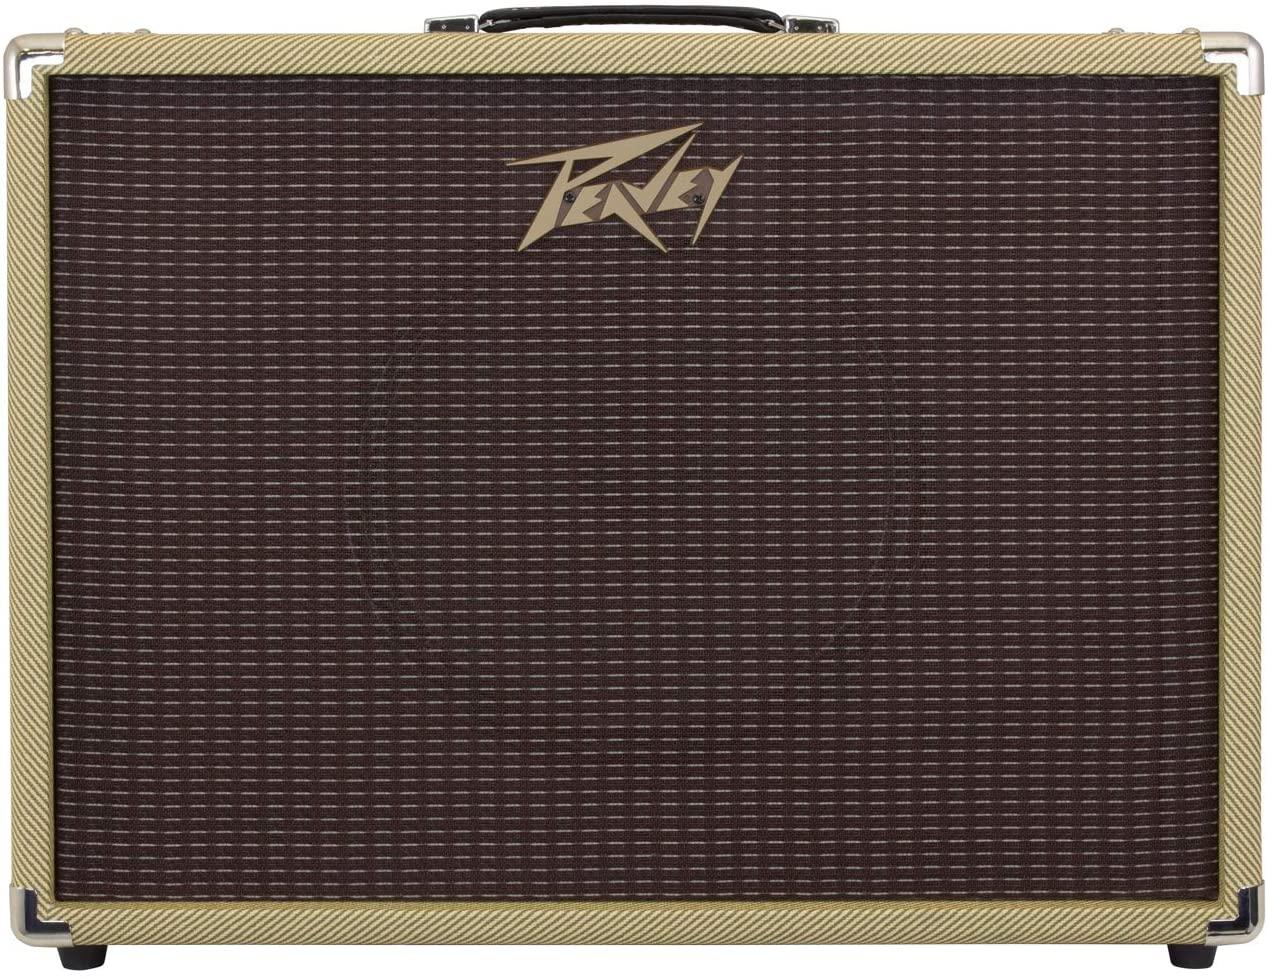 Peavey 112-C 1x12 Guitar Cabinet - Guitar Cabinets